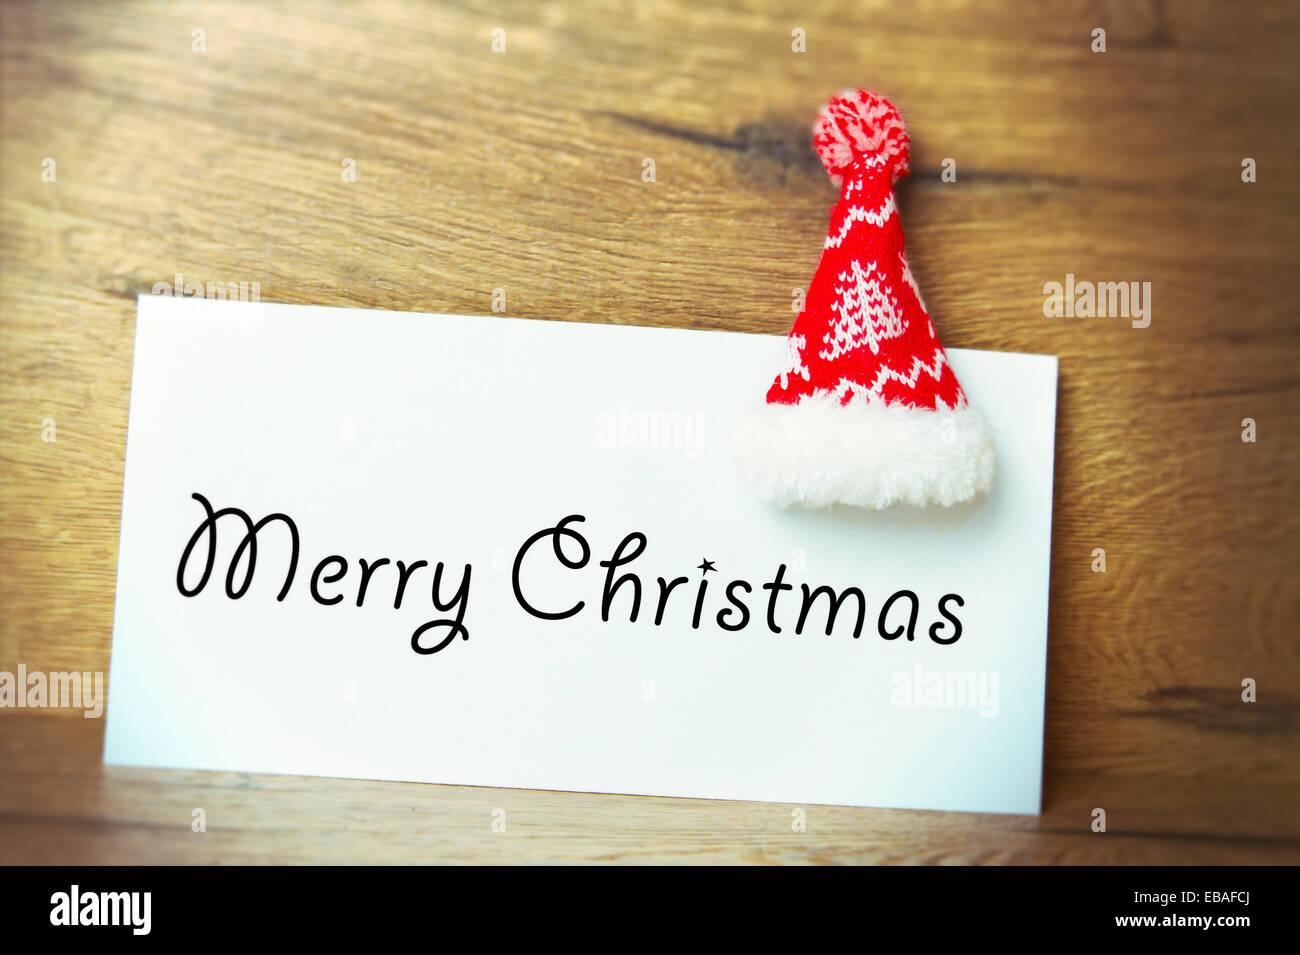 Funny Christmas Card Stock Photos Funny Christmas Card Stock